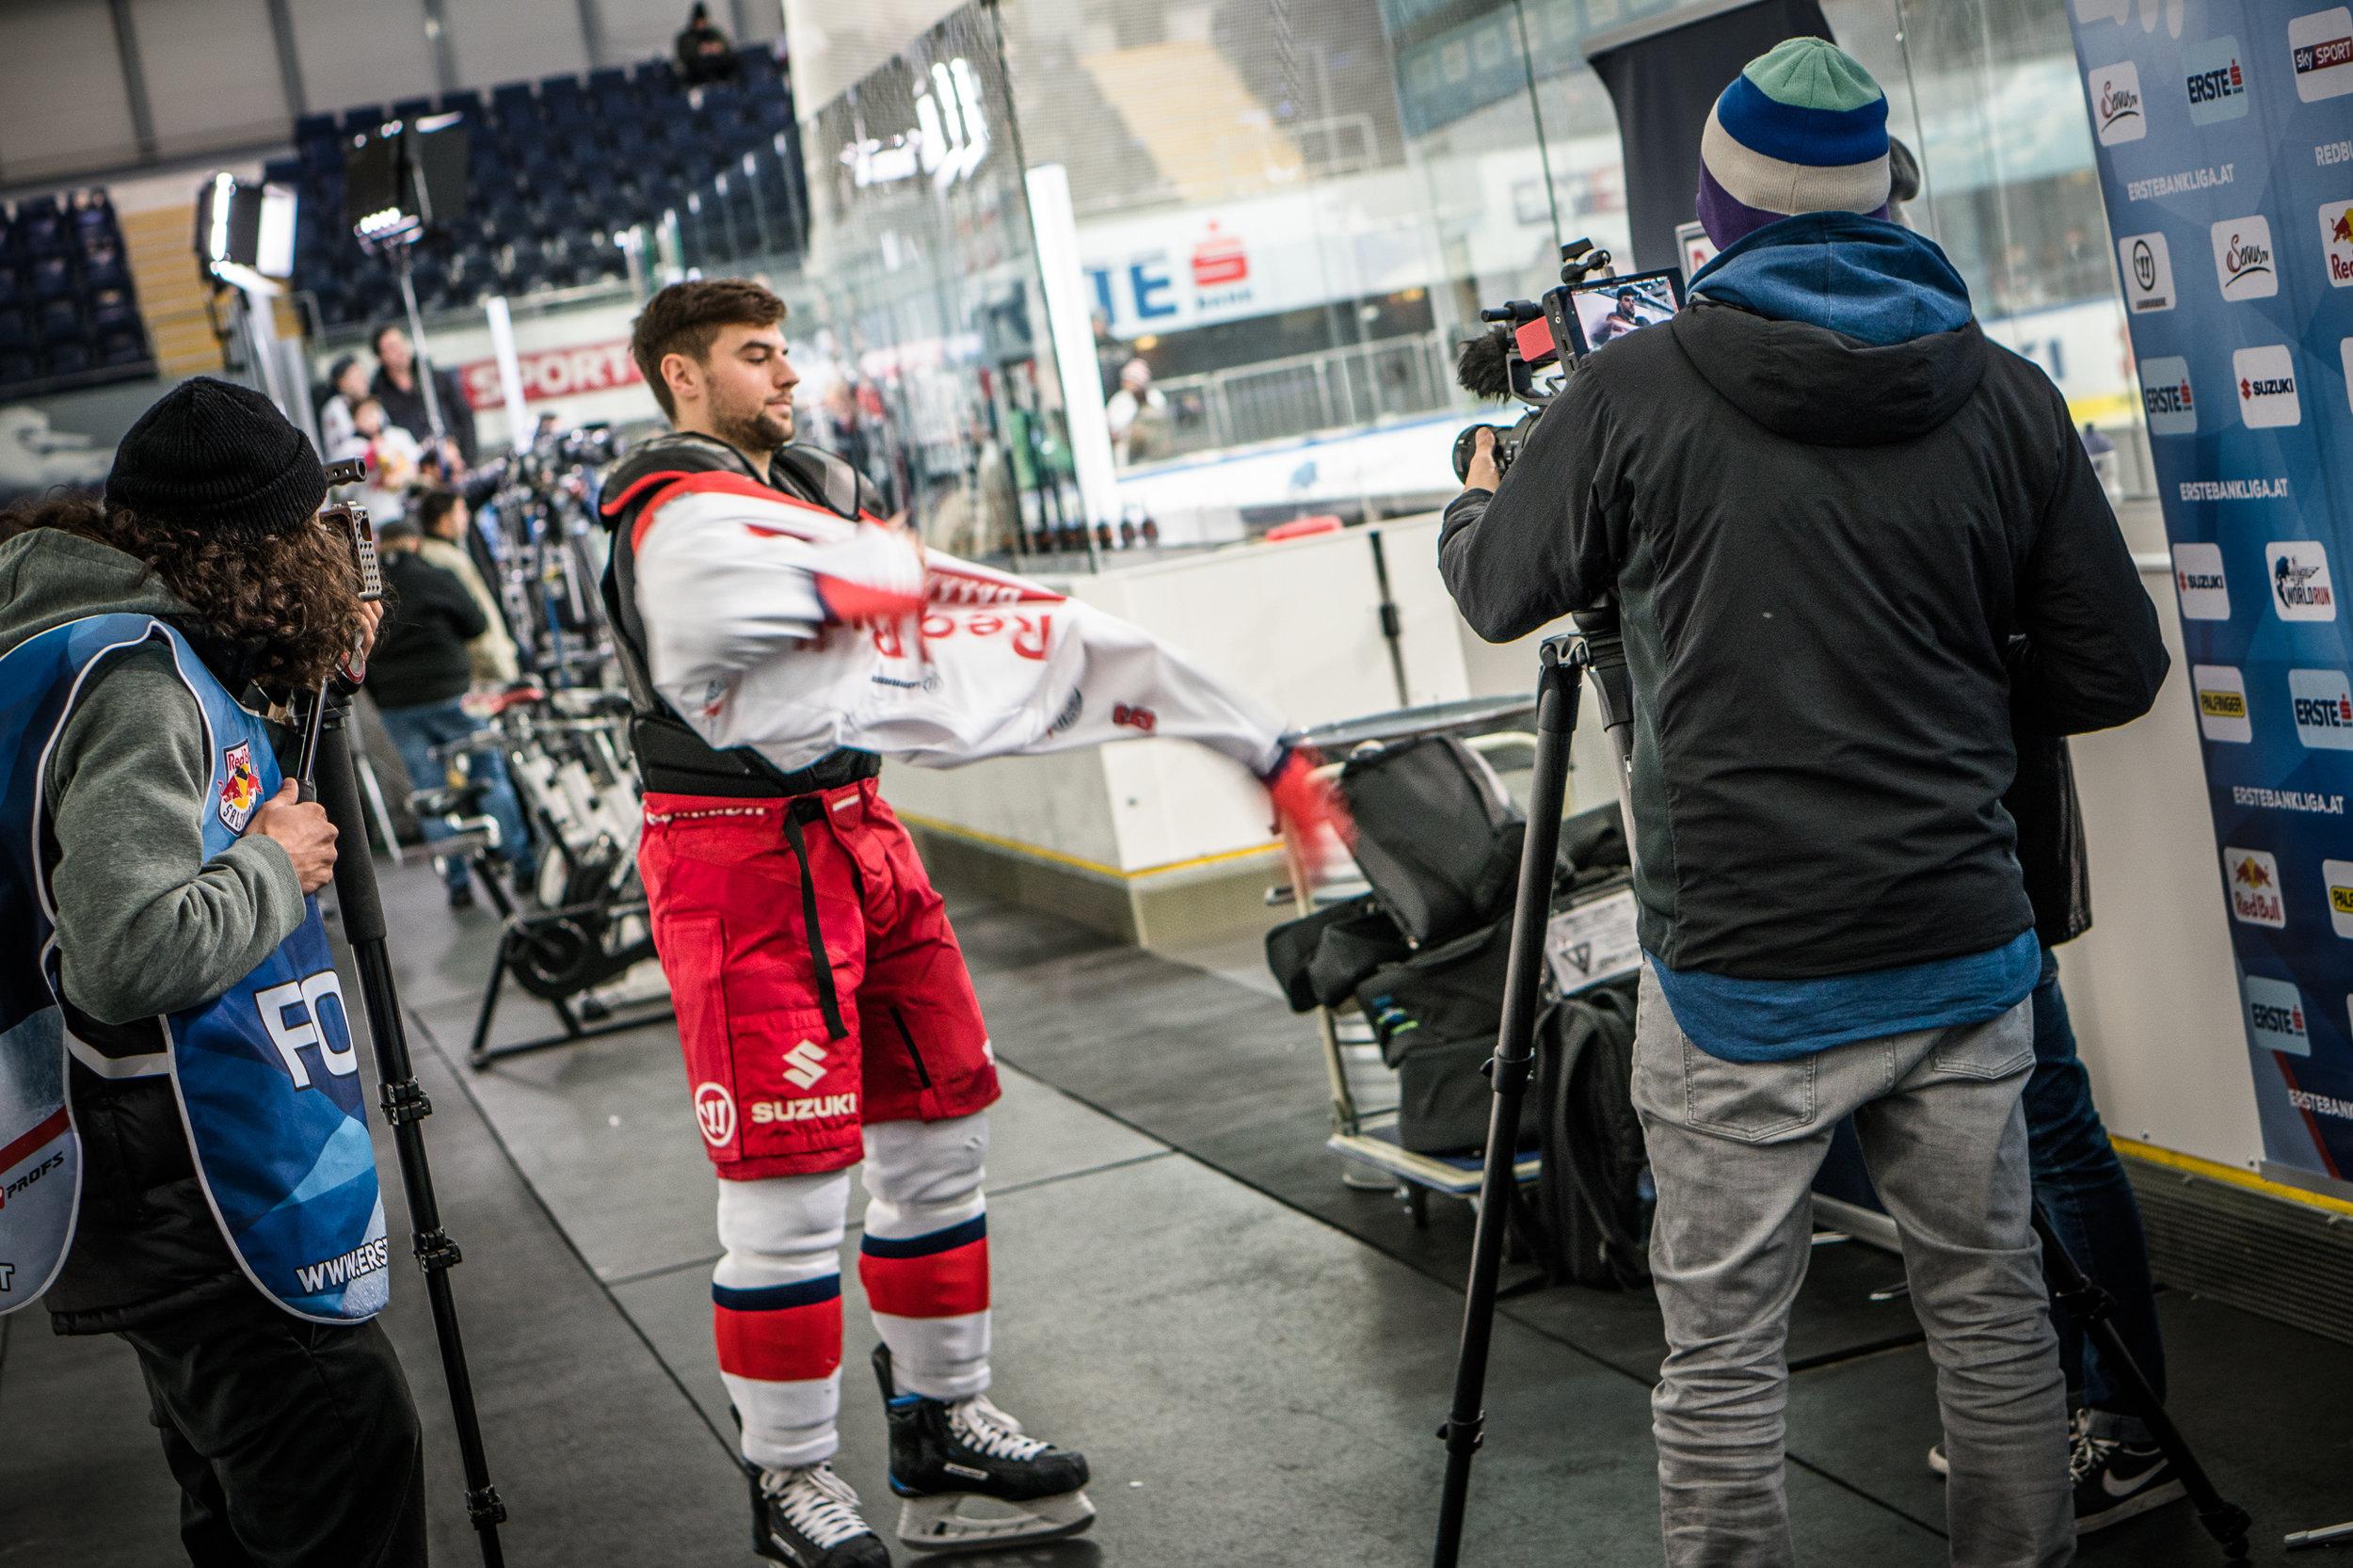 EpicMinutes-Behind-RedBull-Eishockey-WEB-by-BAUSE-015.jpg